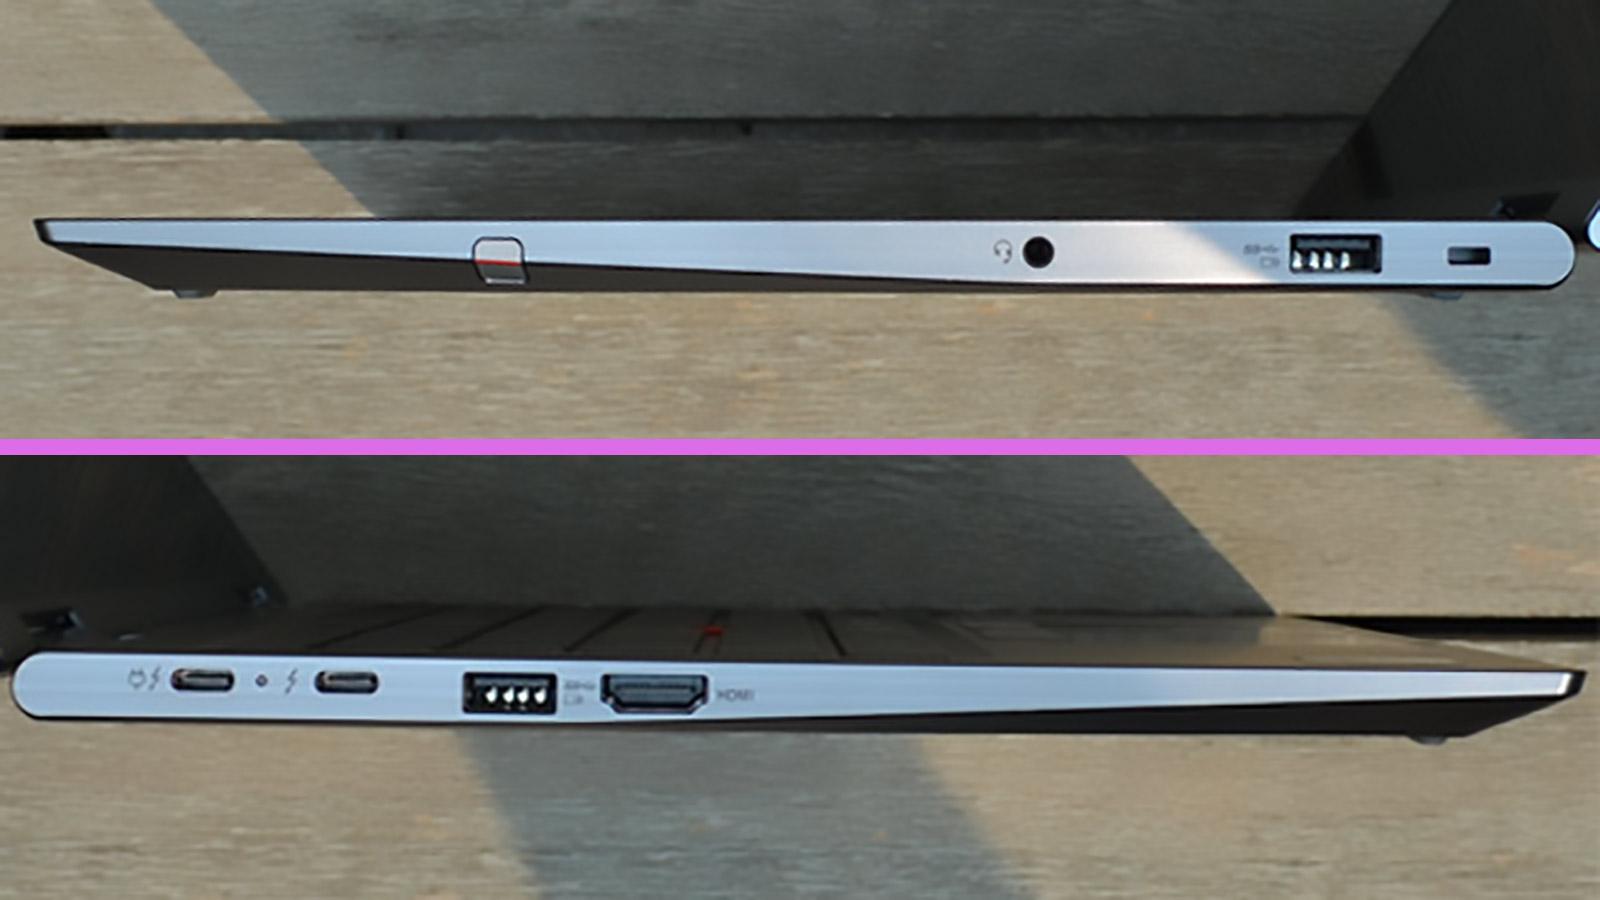 Lenovo ThinkPad X1 Yoga Ports